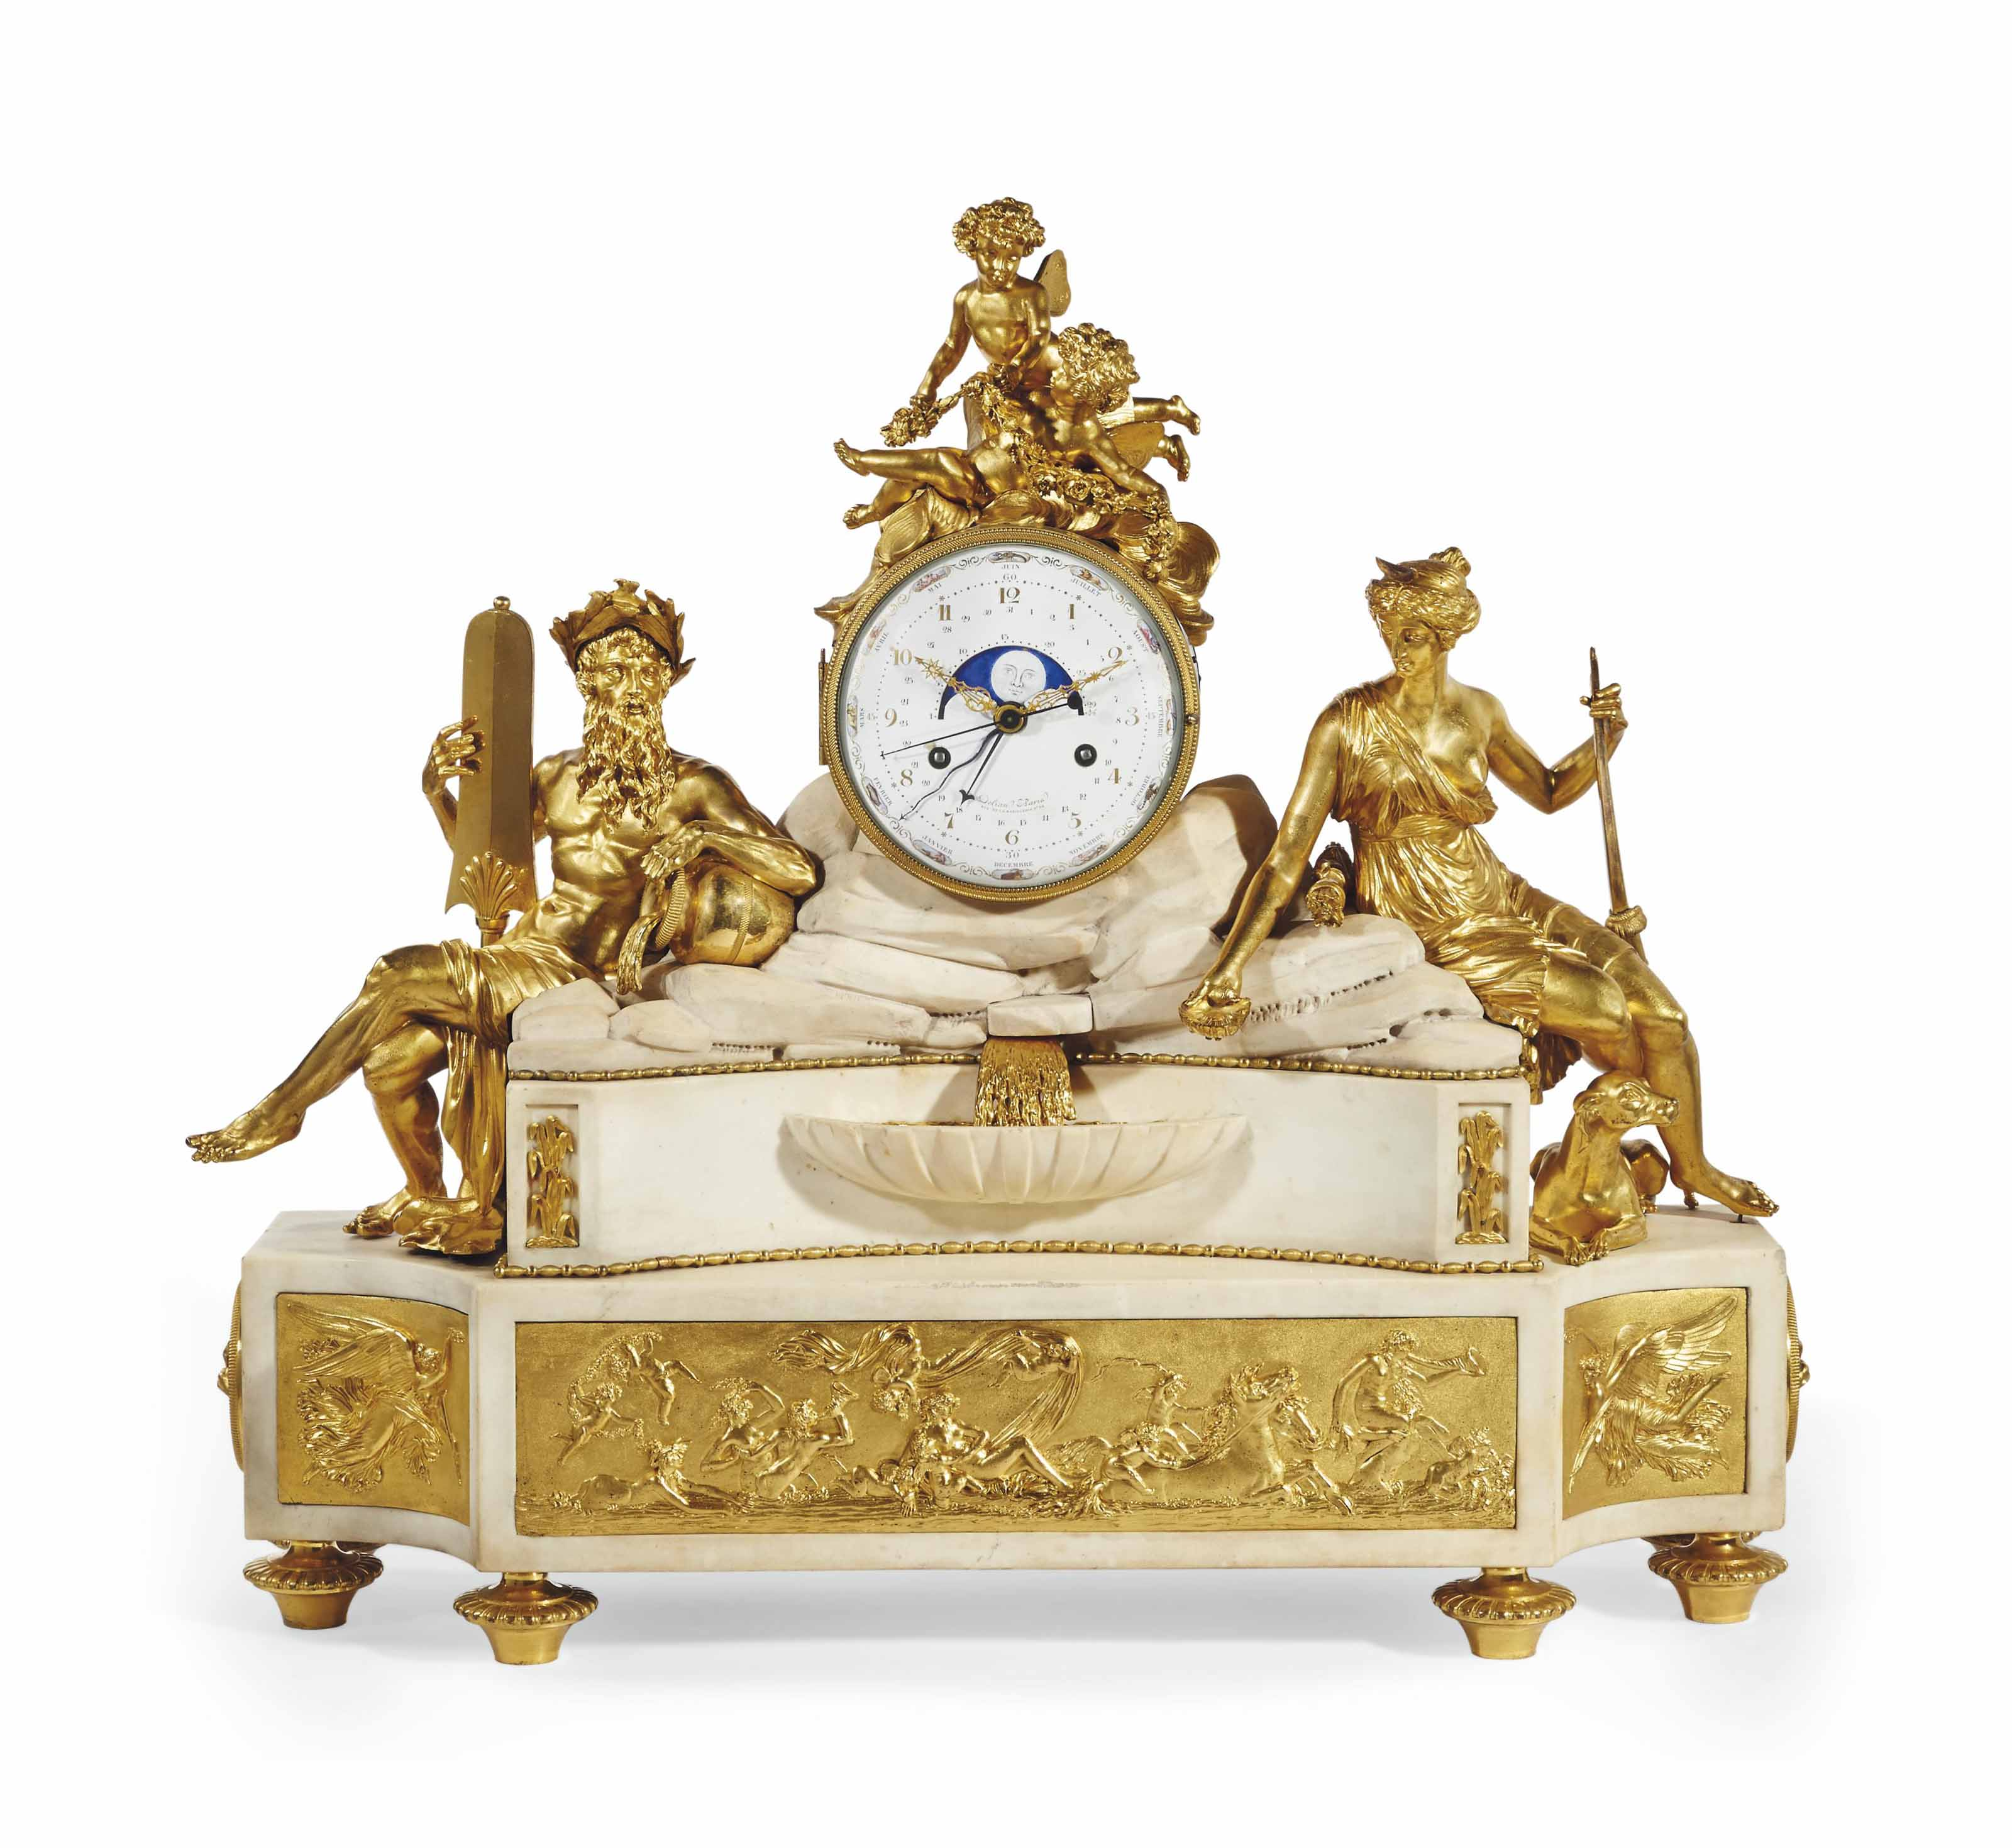 pendule monumentale de la fin de l 39 epoque louis xvi signature de deliau datee 1796 christie 39 s. Black Bedroom Furniture Sets. Home Design Ideas